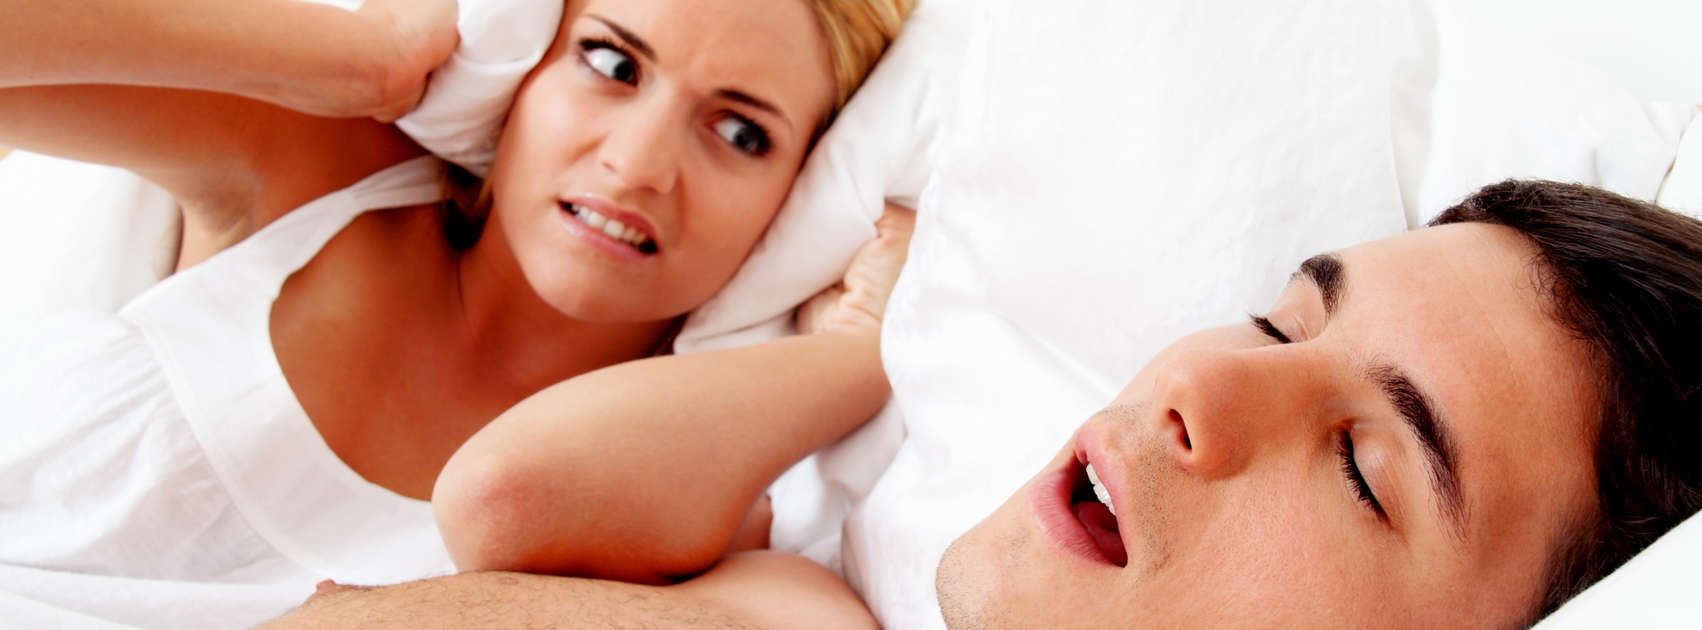 kwade vrouw naast snurkende man in bed